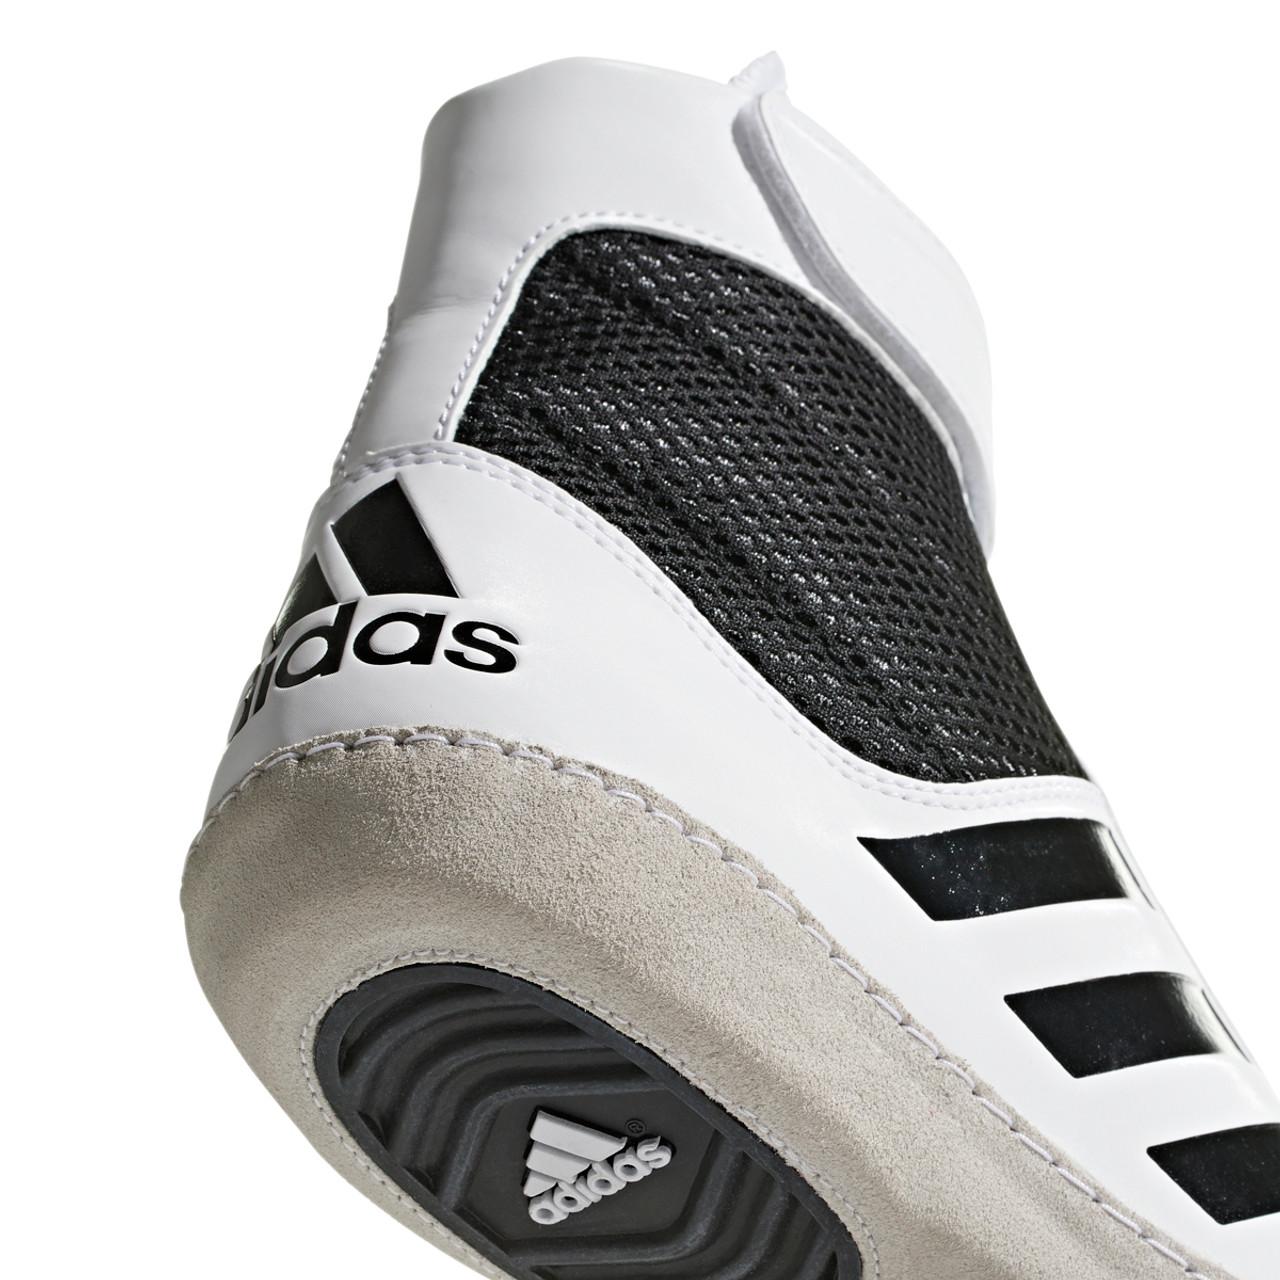 Adidas Combat Speed 5 Adult Wrestling Shoes AC7501 - White, Black